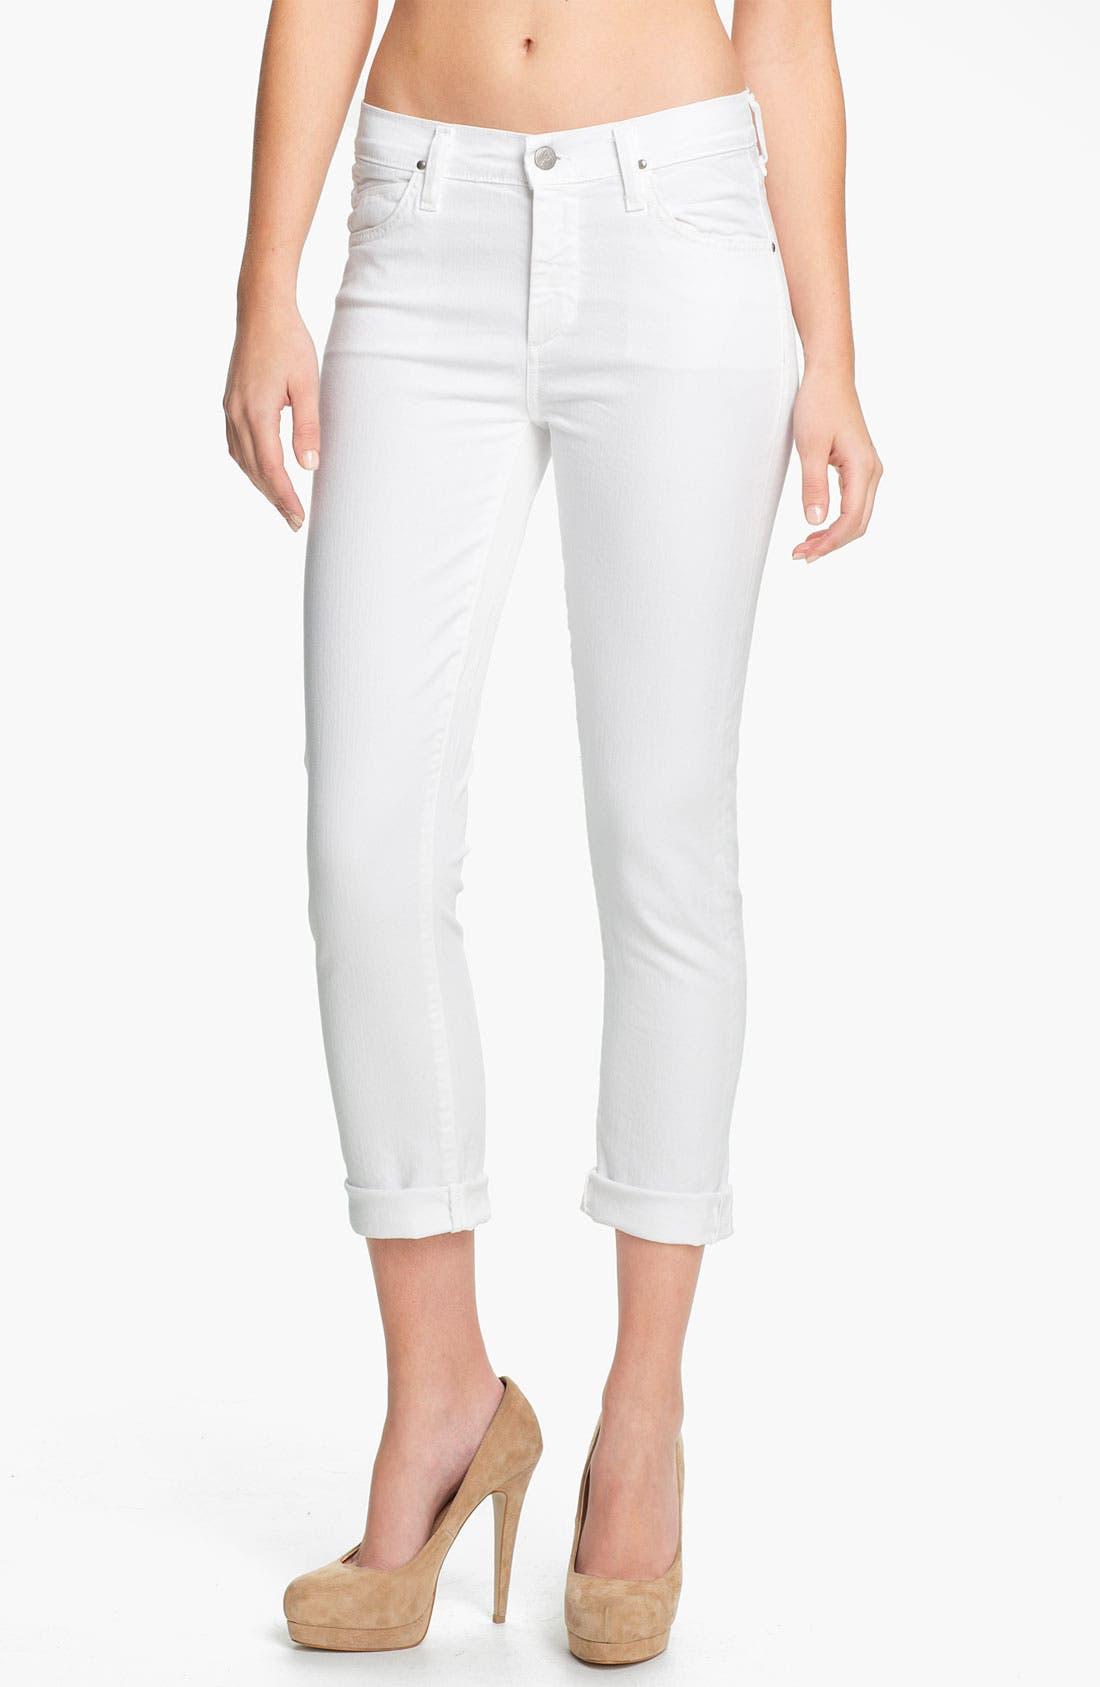 Main Image - Citizens of Humanity 'Carlton' High-Waist Slim Straight Leg Ankle Jeans (Santorini)